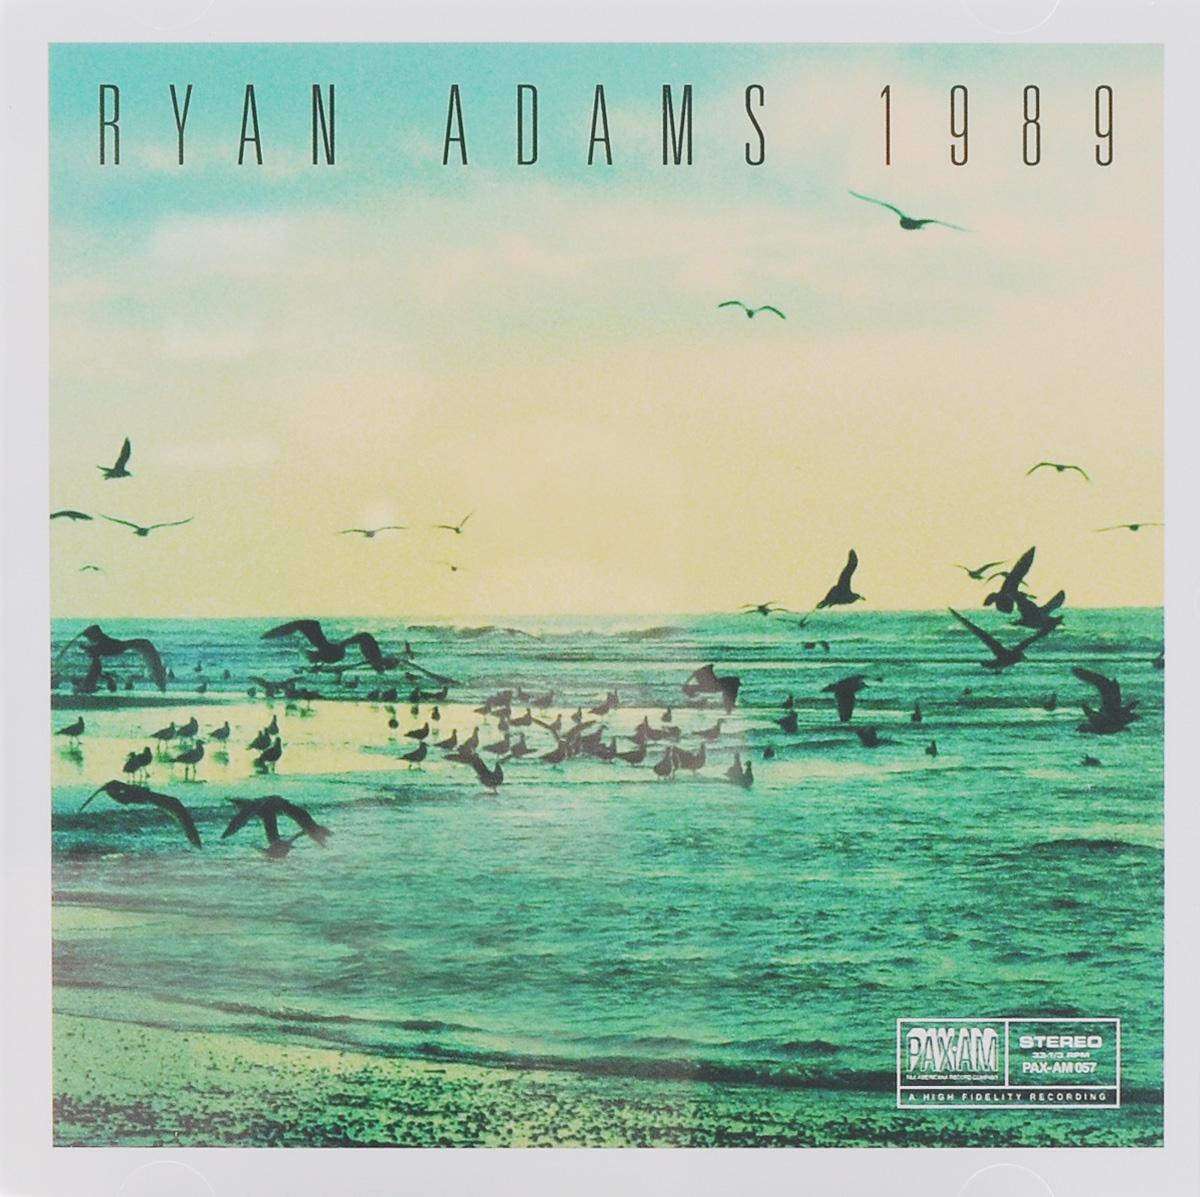 Райан Адамс Ryan Adams. 1989 райан адамс ryan adams ten songs from live at carnegie hall lp